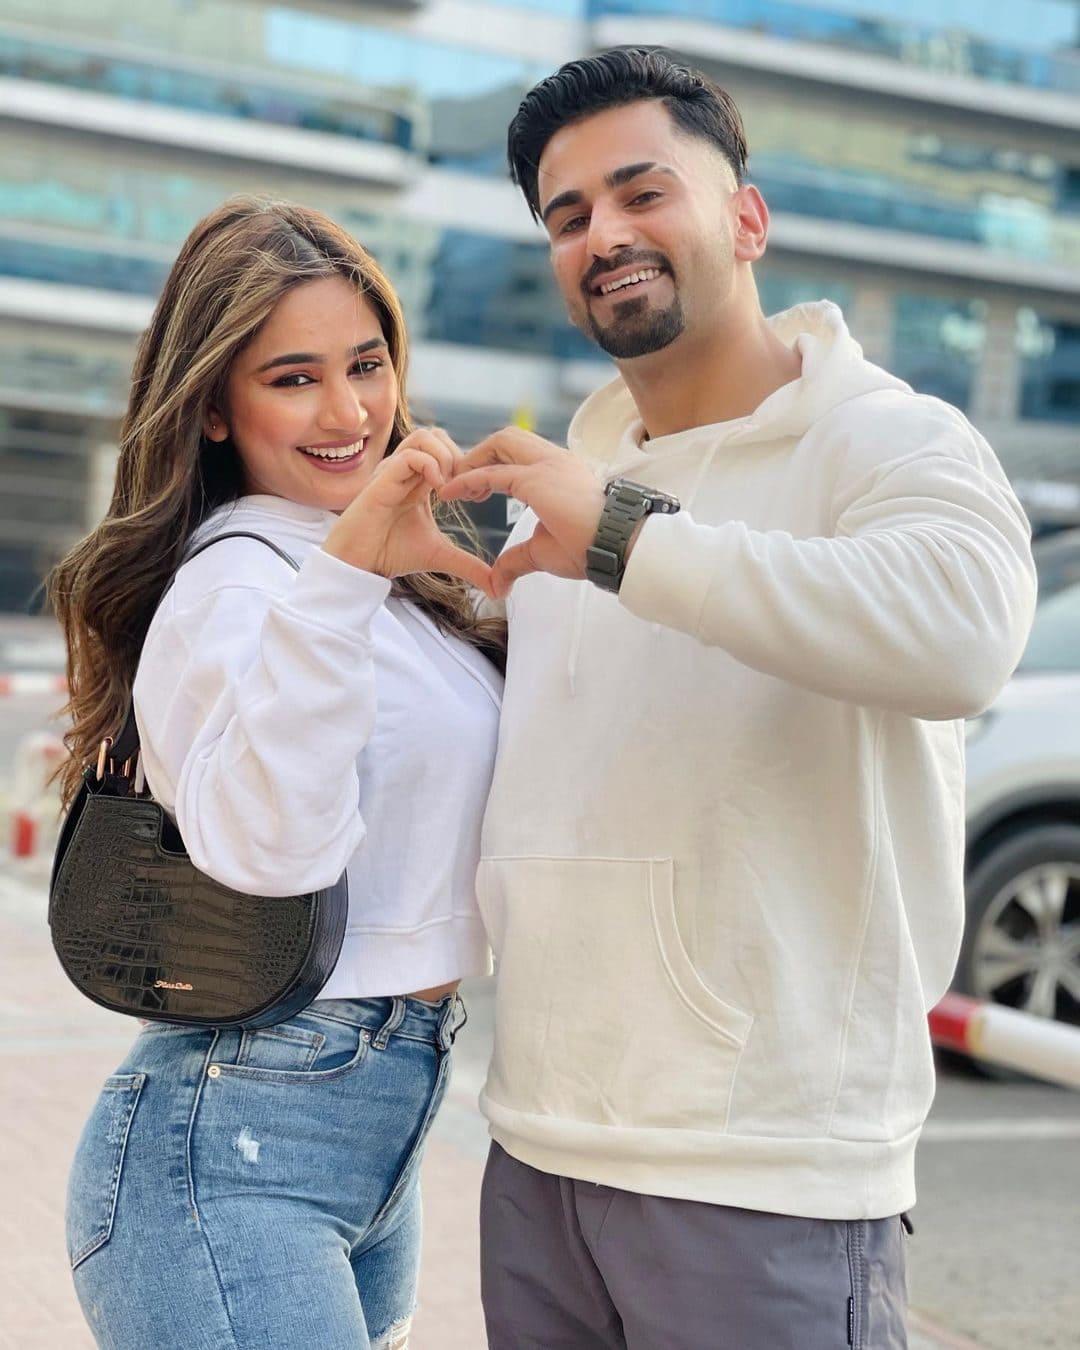 Sameer Handoo with his girlfriend Pooja Thapa